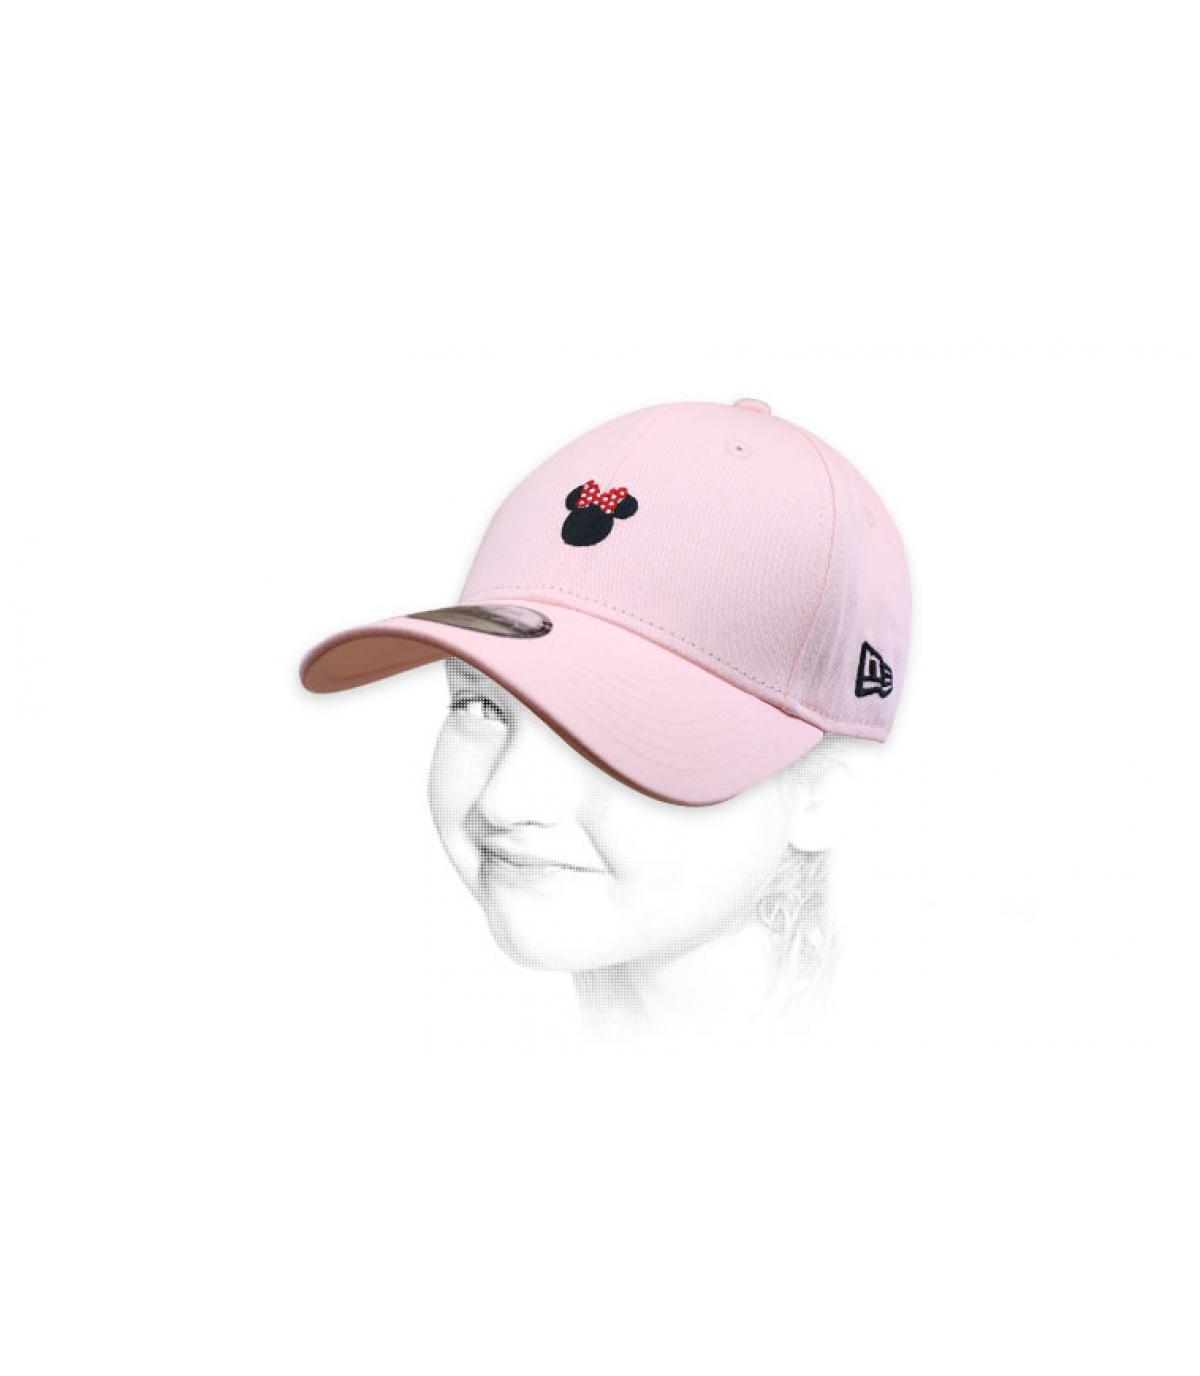 pink Minnie cap